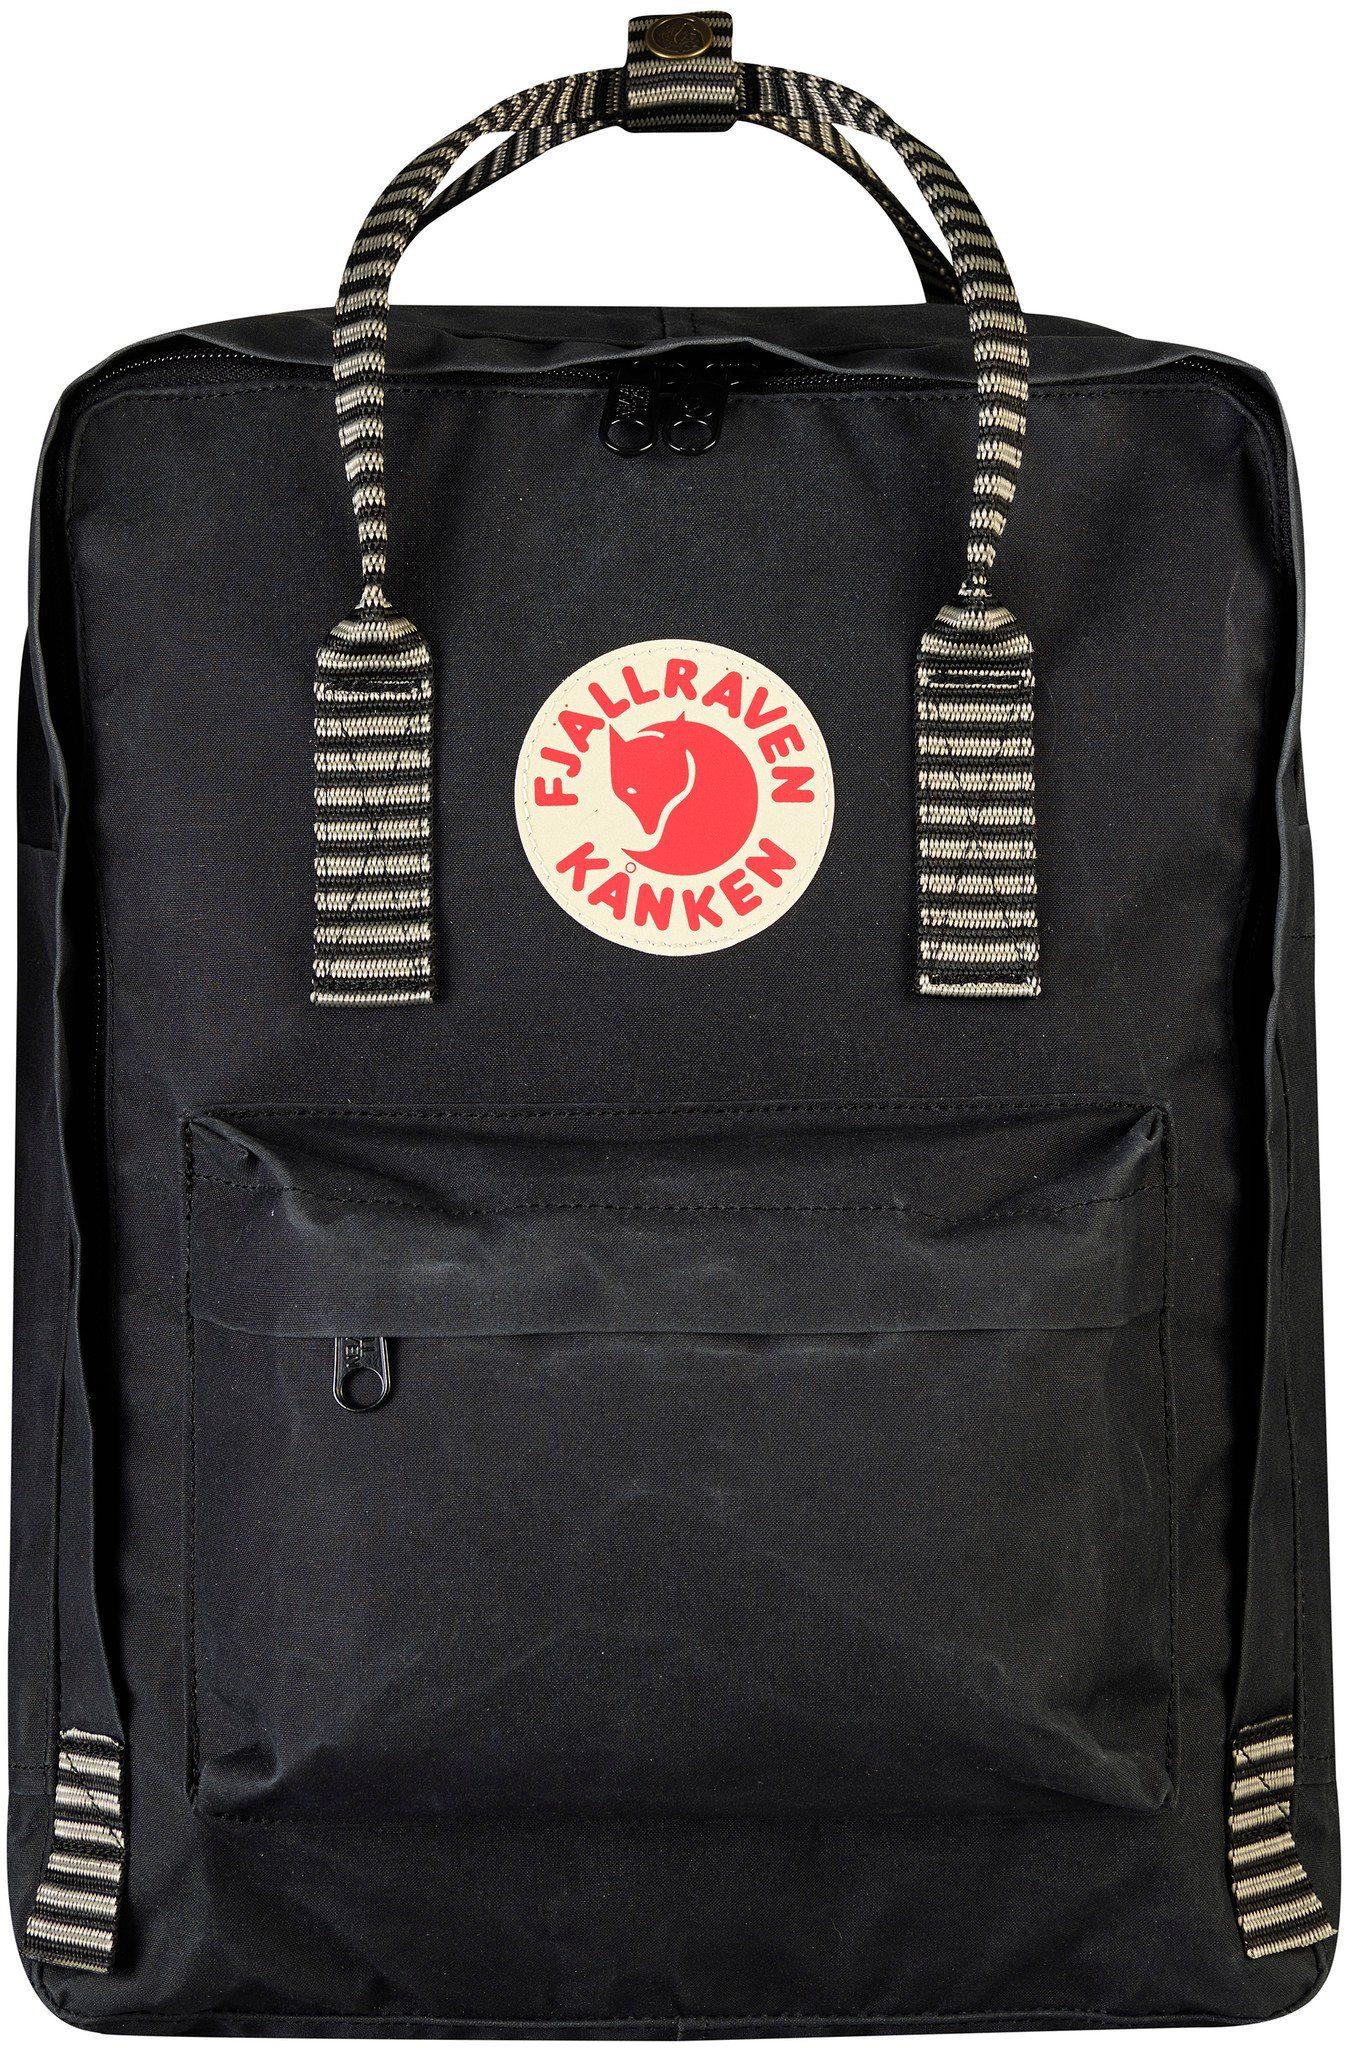 FJÄLLRÄVEN Sport- und Freizeittasche »Fjällräven Kånken Backpack«